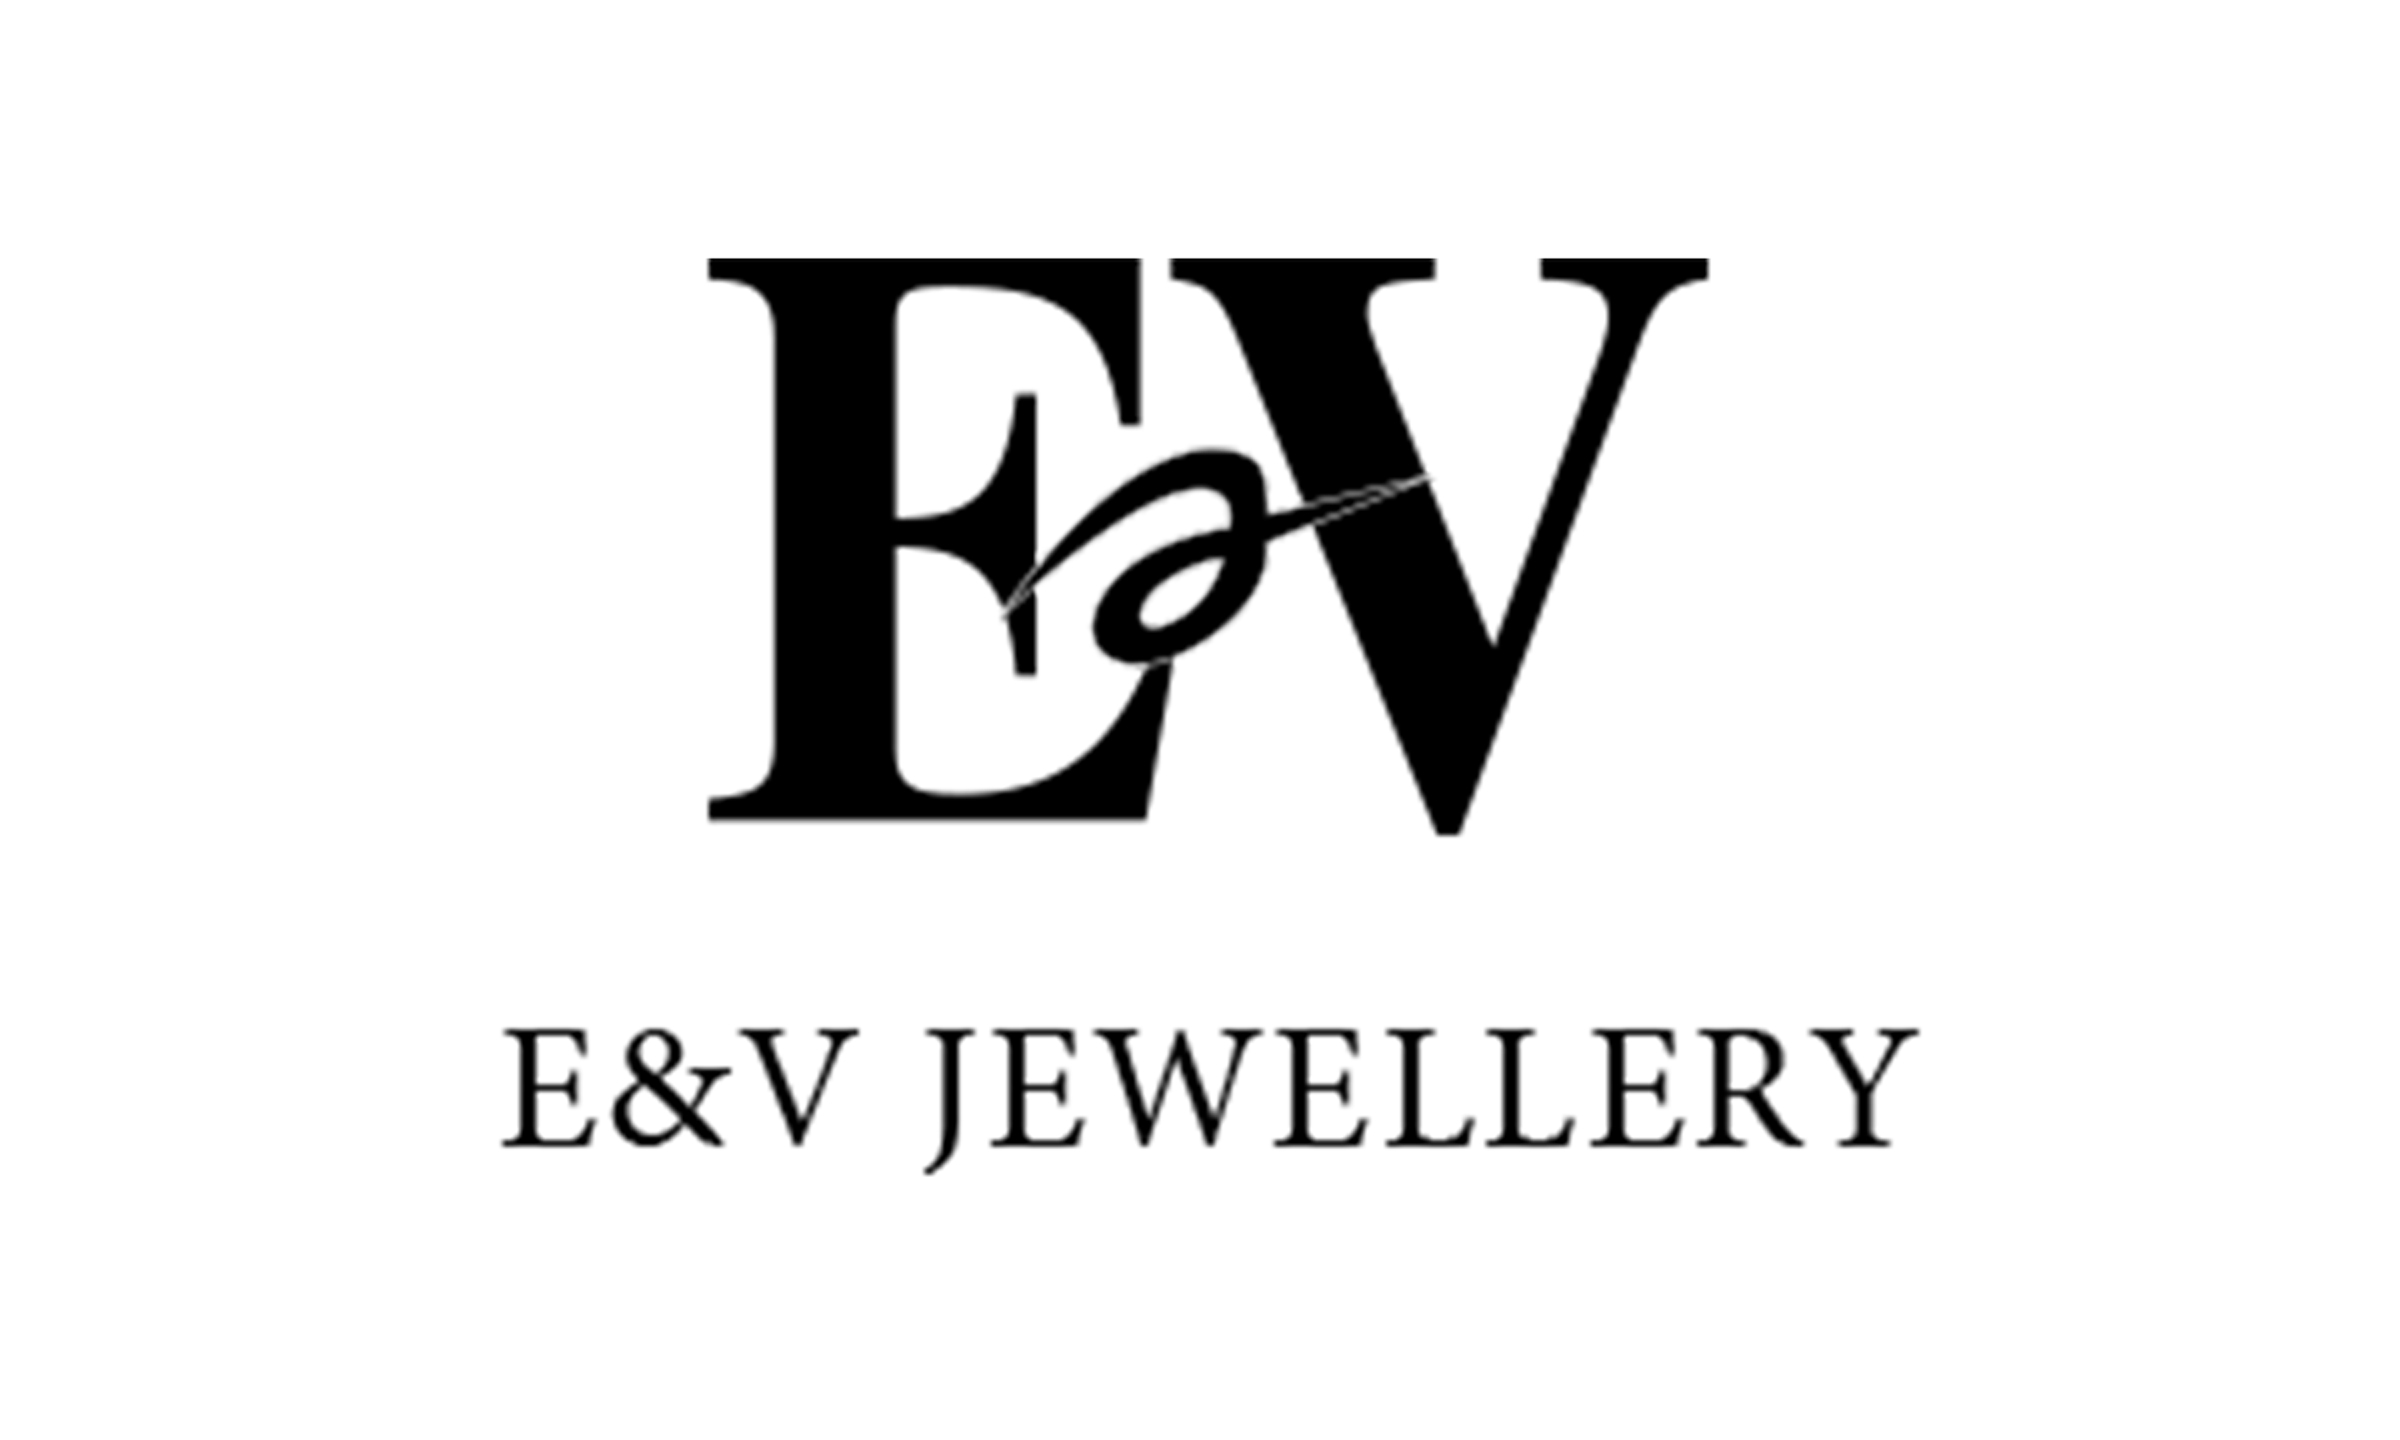 E&V Jewellery